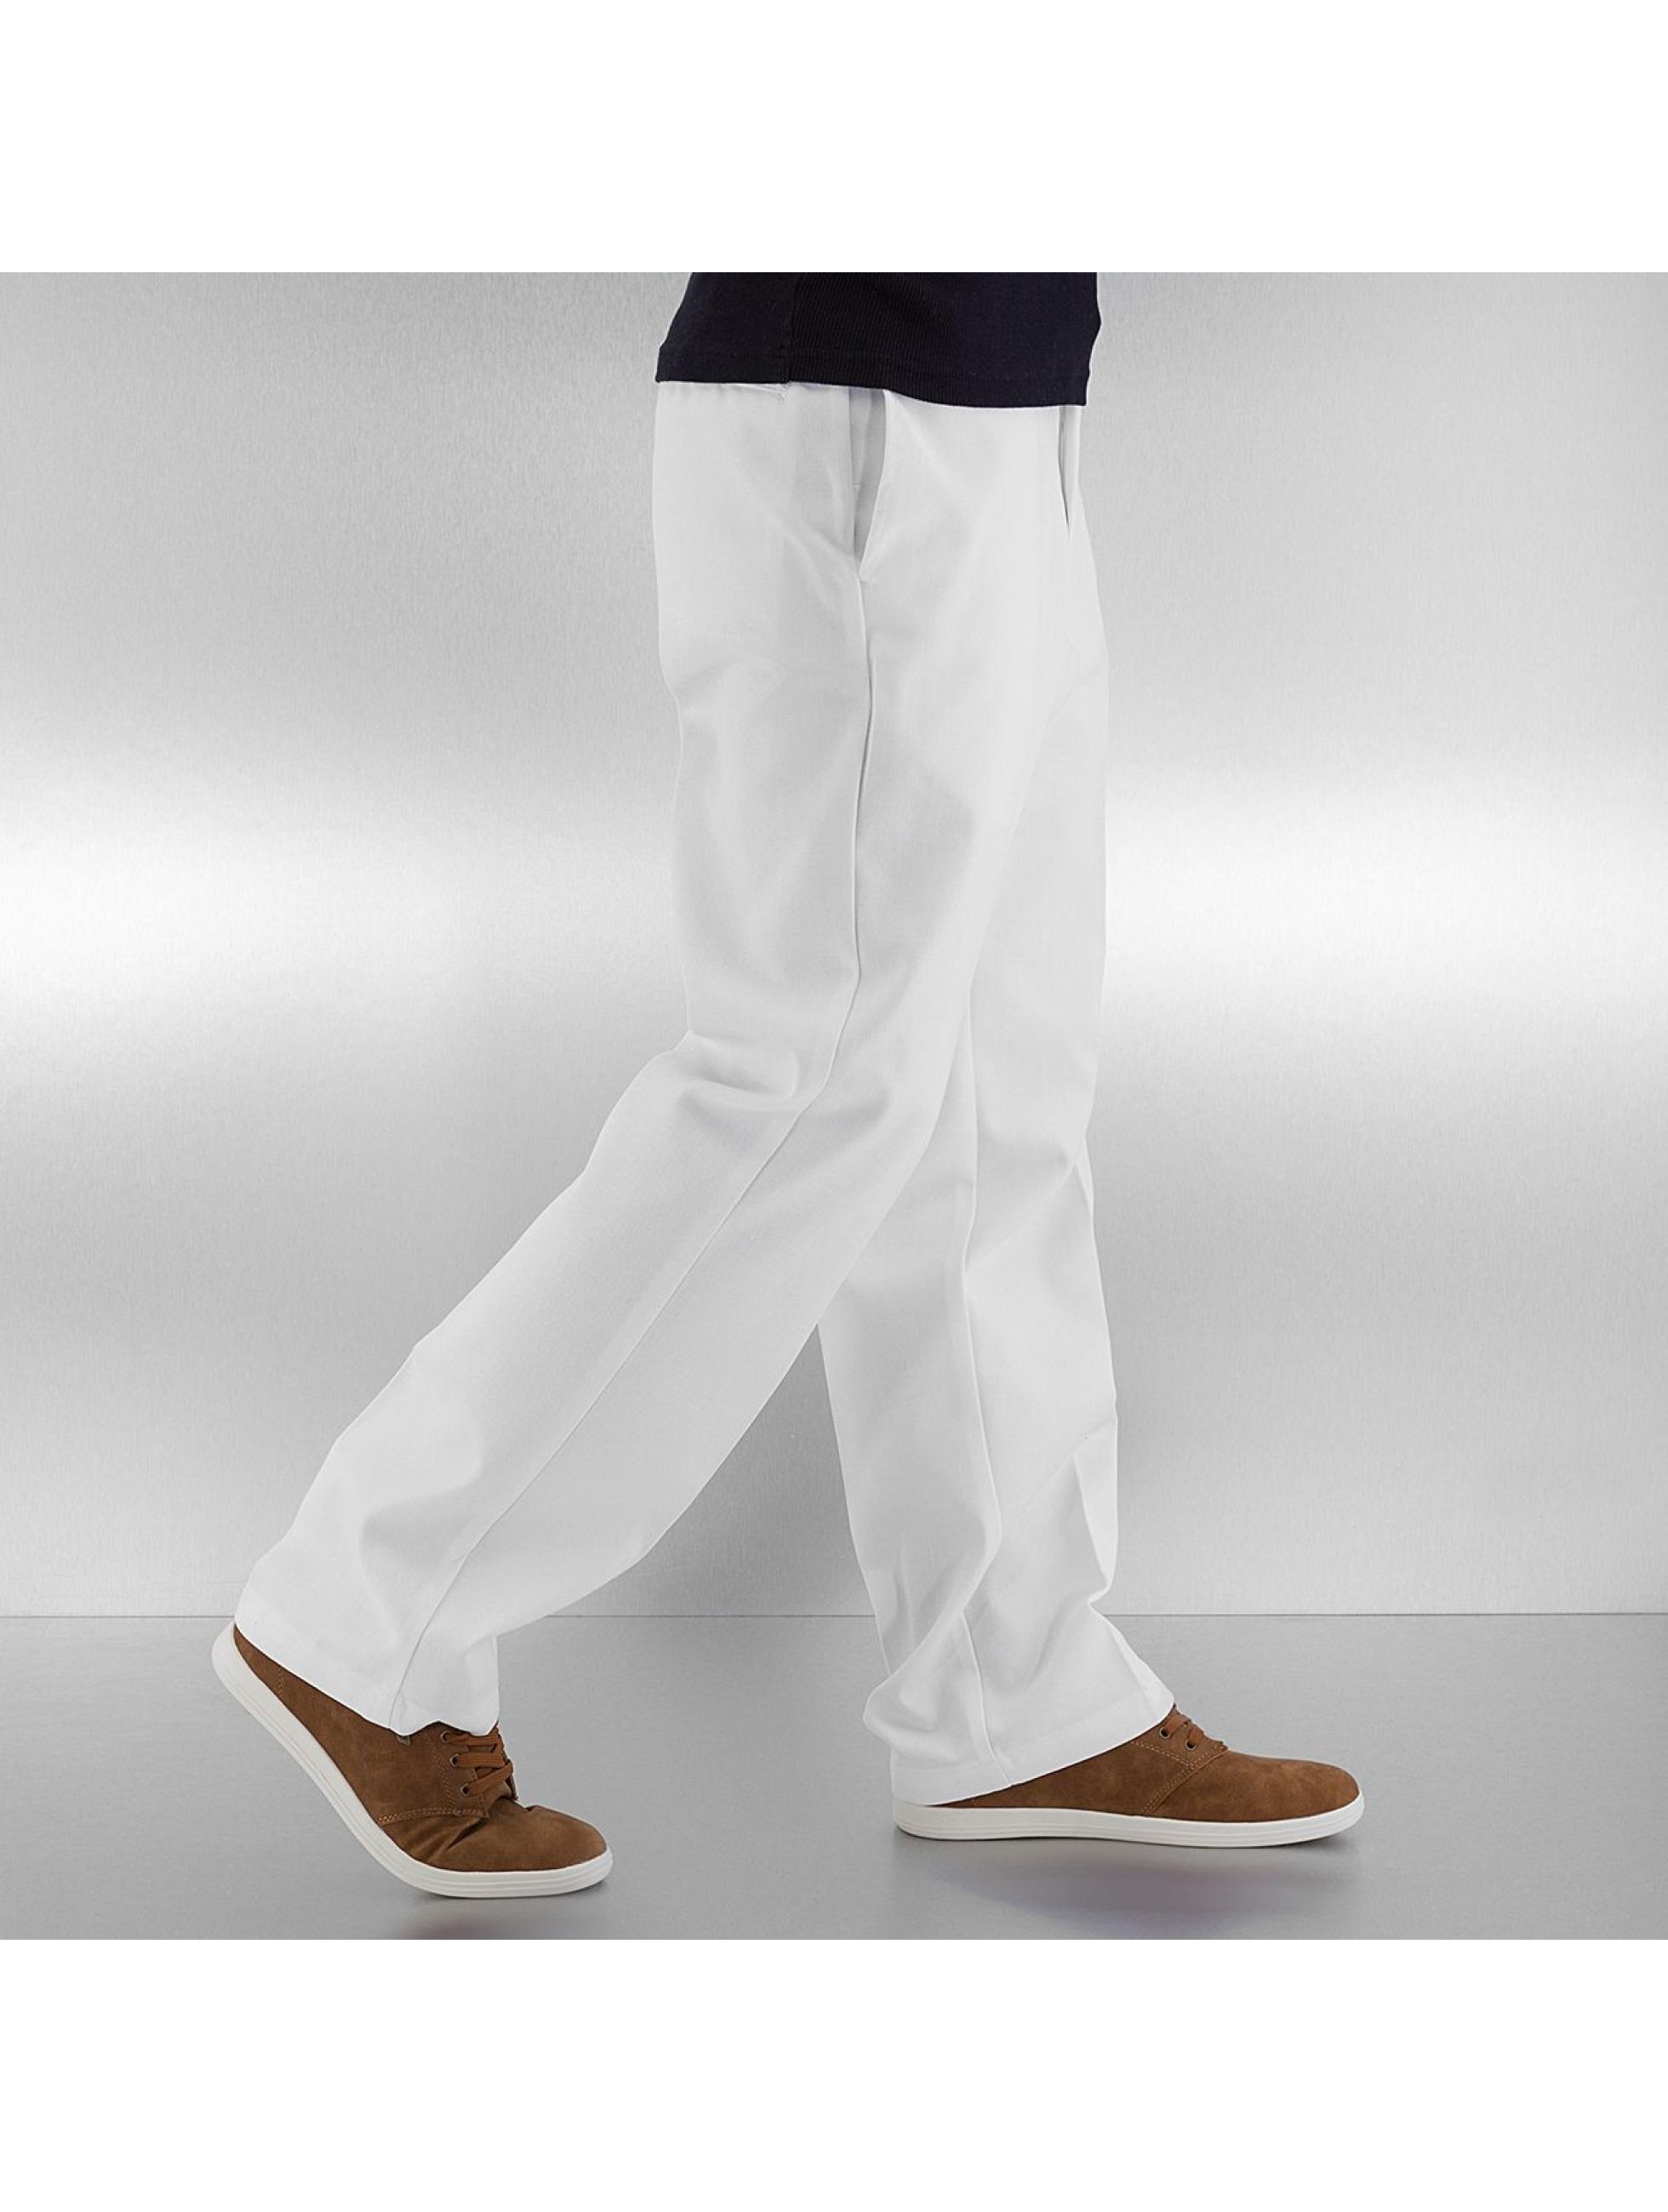 dickies original 874 work blanc homme pantalon chino 132886. Black Bedroom Furniture Sets. Home Design Ideas